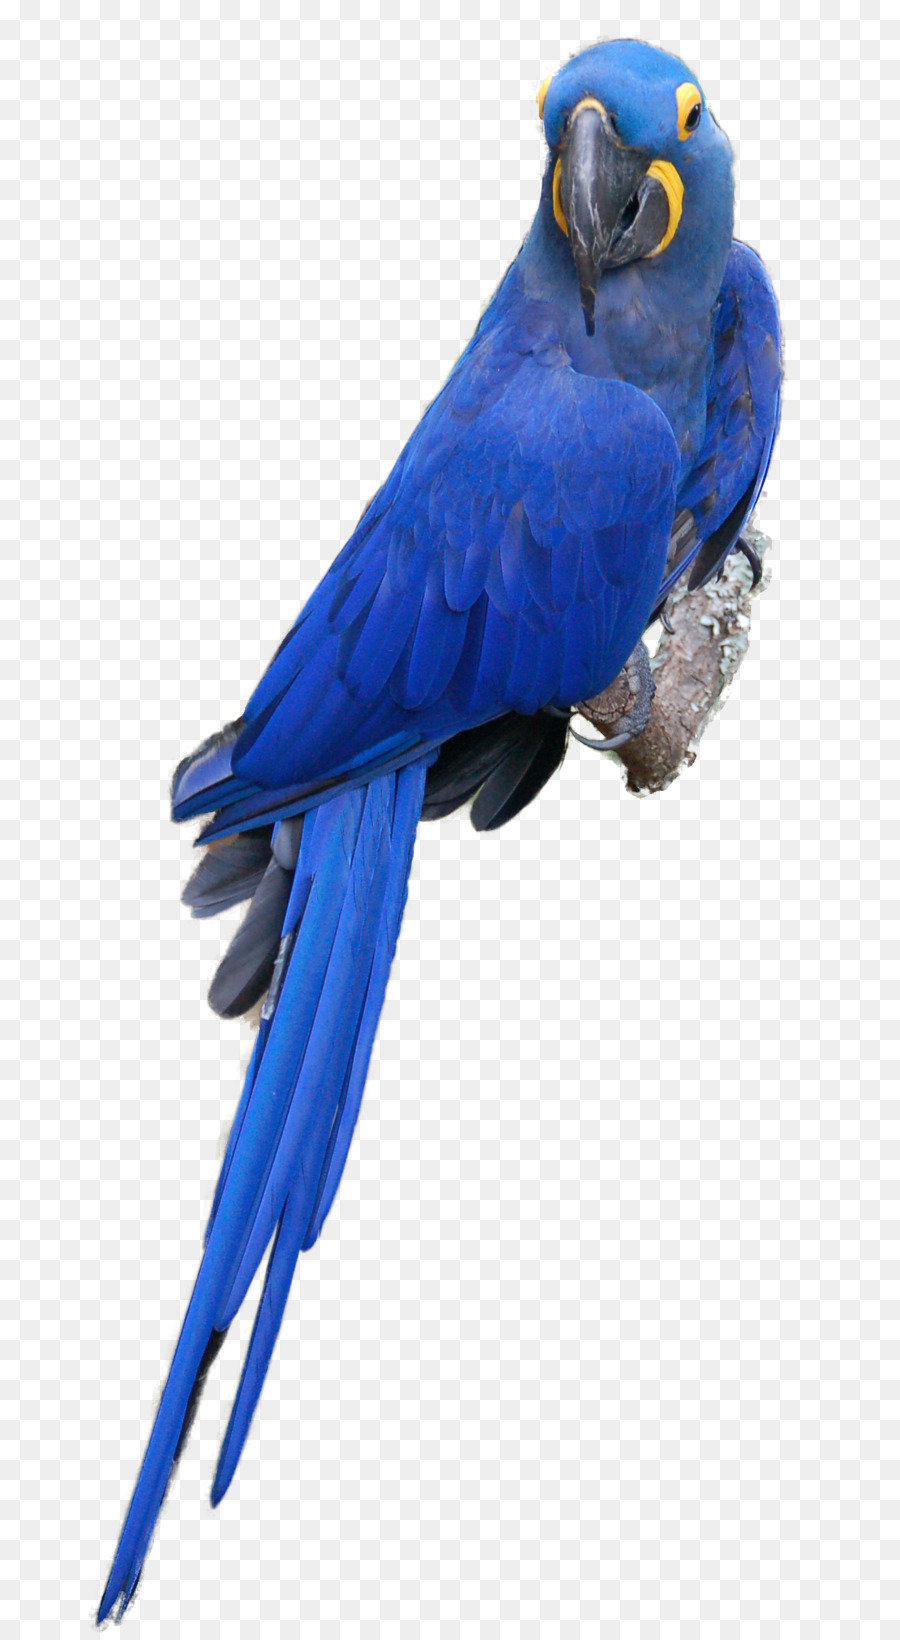 Blue parrot clipart transparent download Bird Parrot clipart - Parrot, Bird, Feather, transparent clip art transparent download